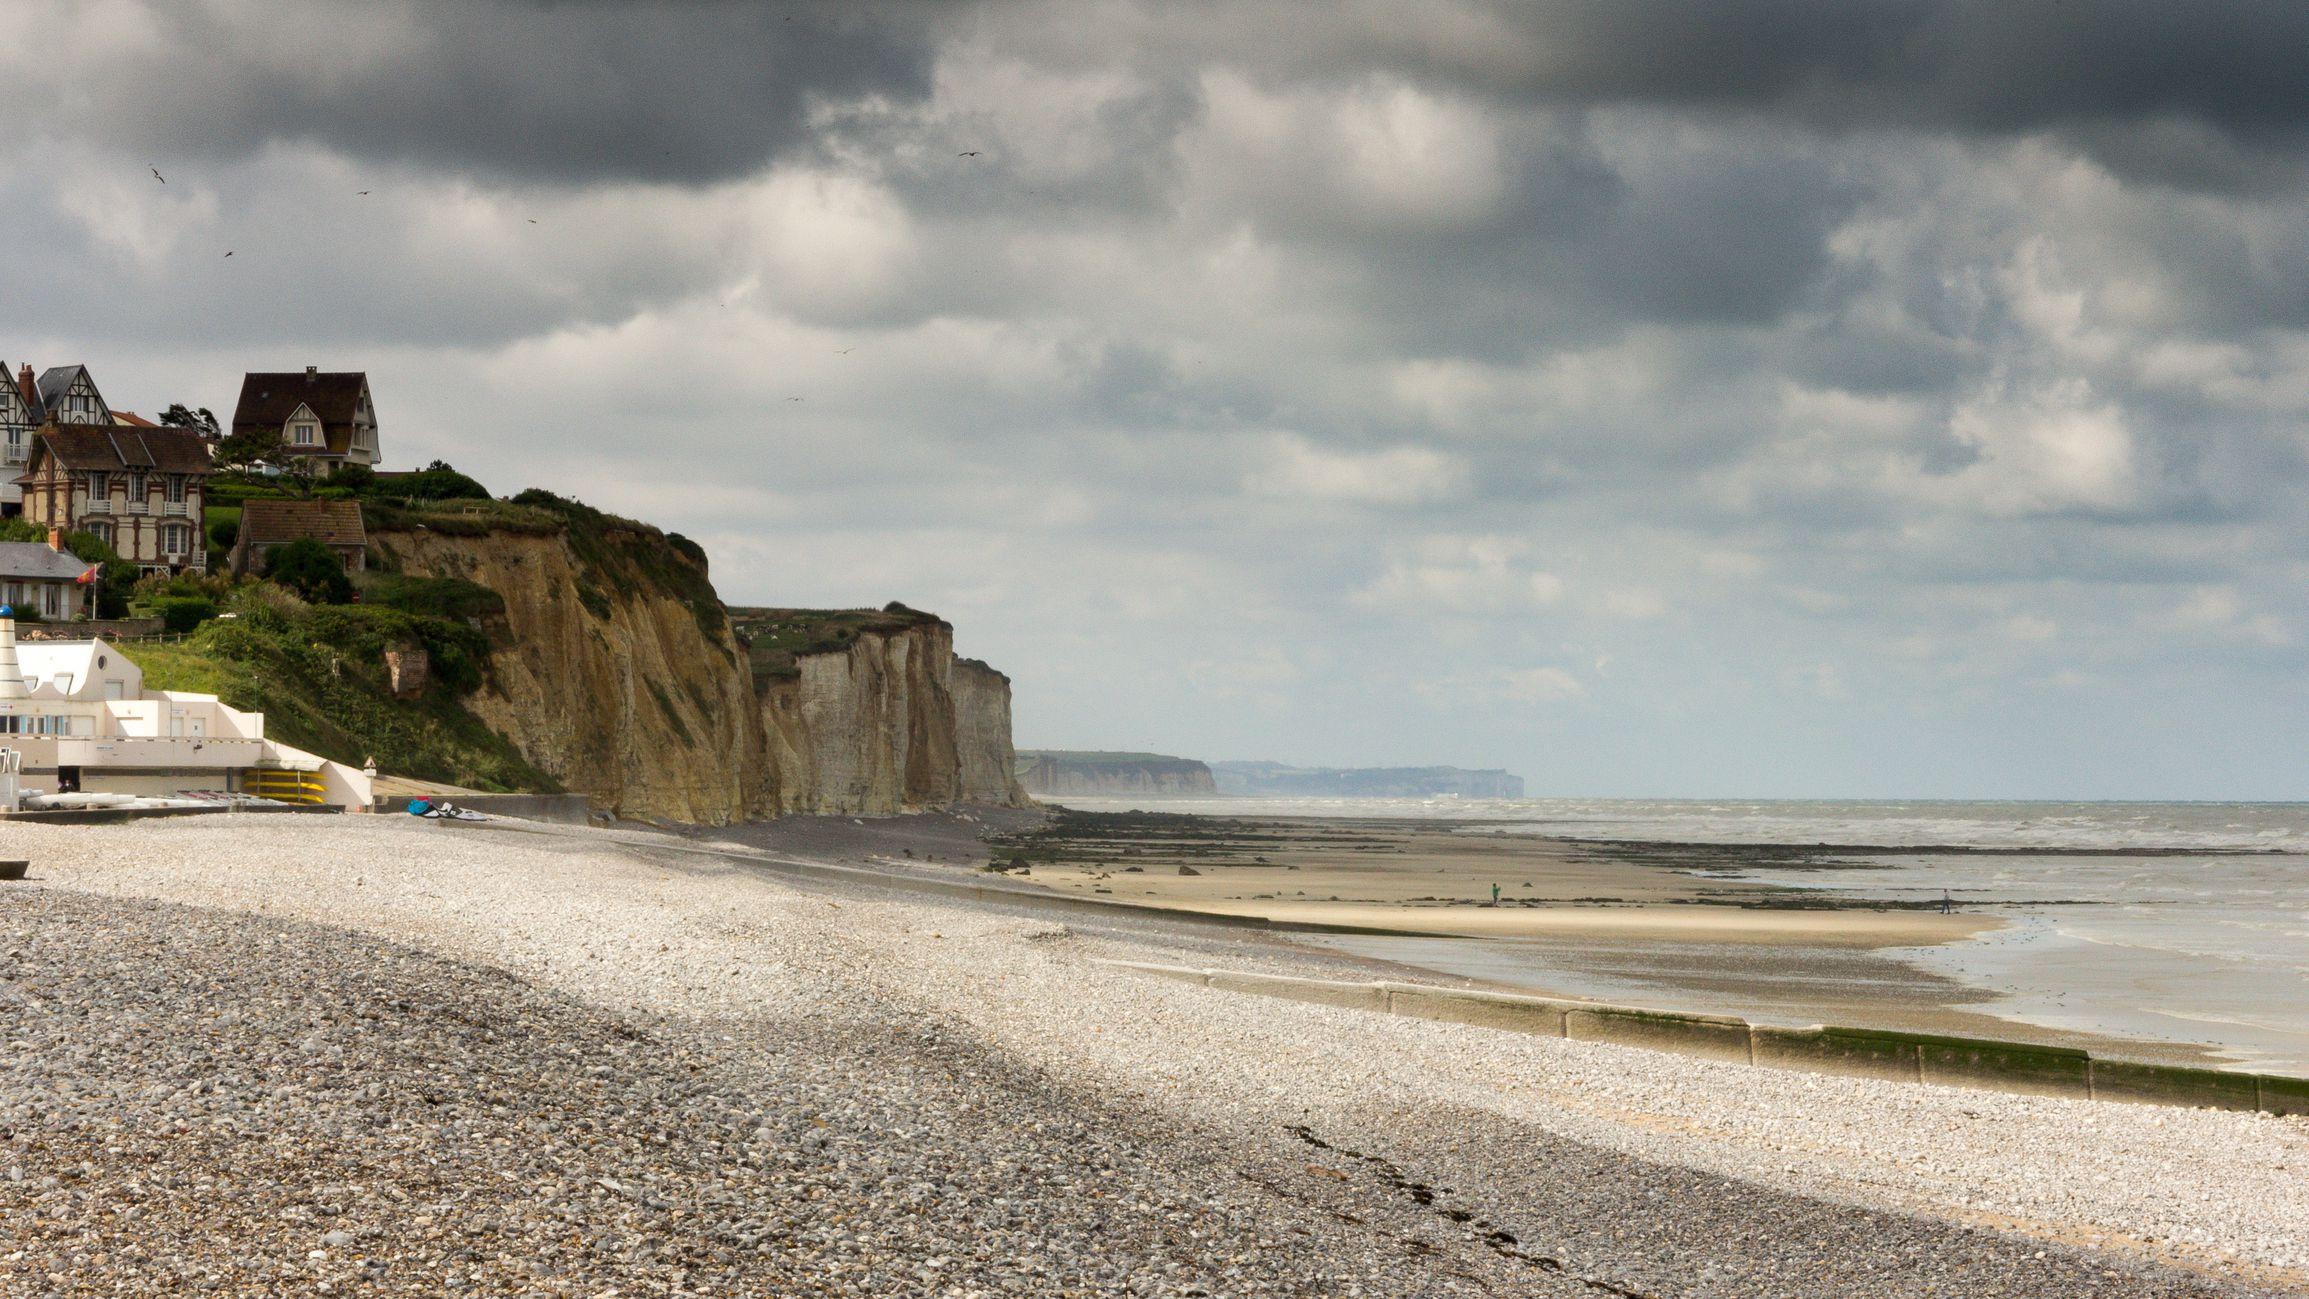 Bãi biển Urville – Nacqueville , Normandy